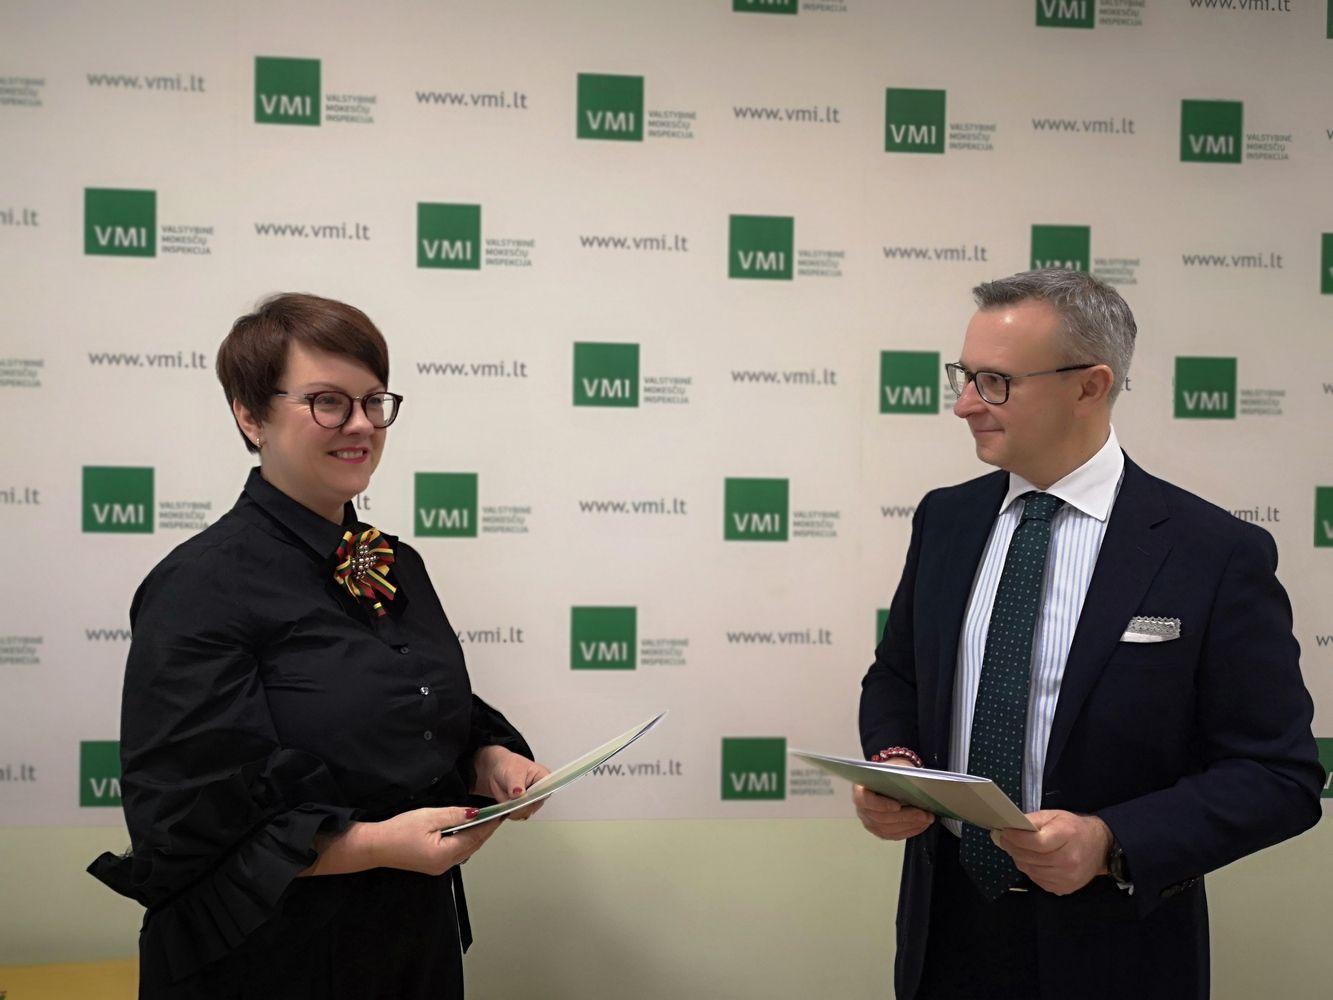 Priimdami sprendimus bankai galės remtis VMI duomenimis